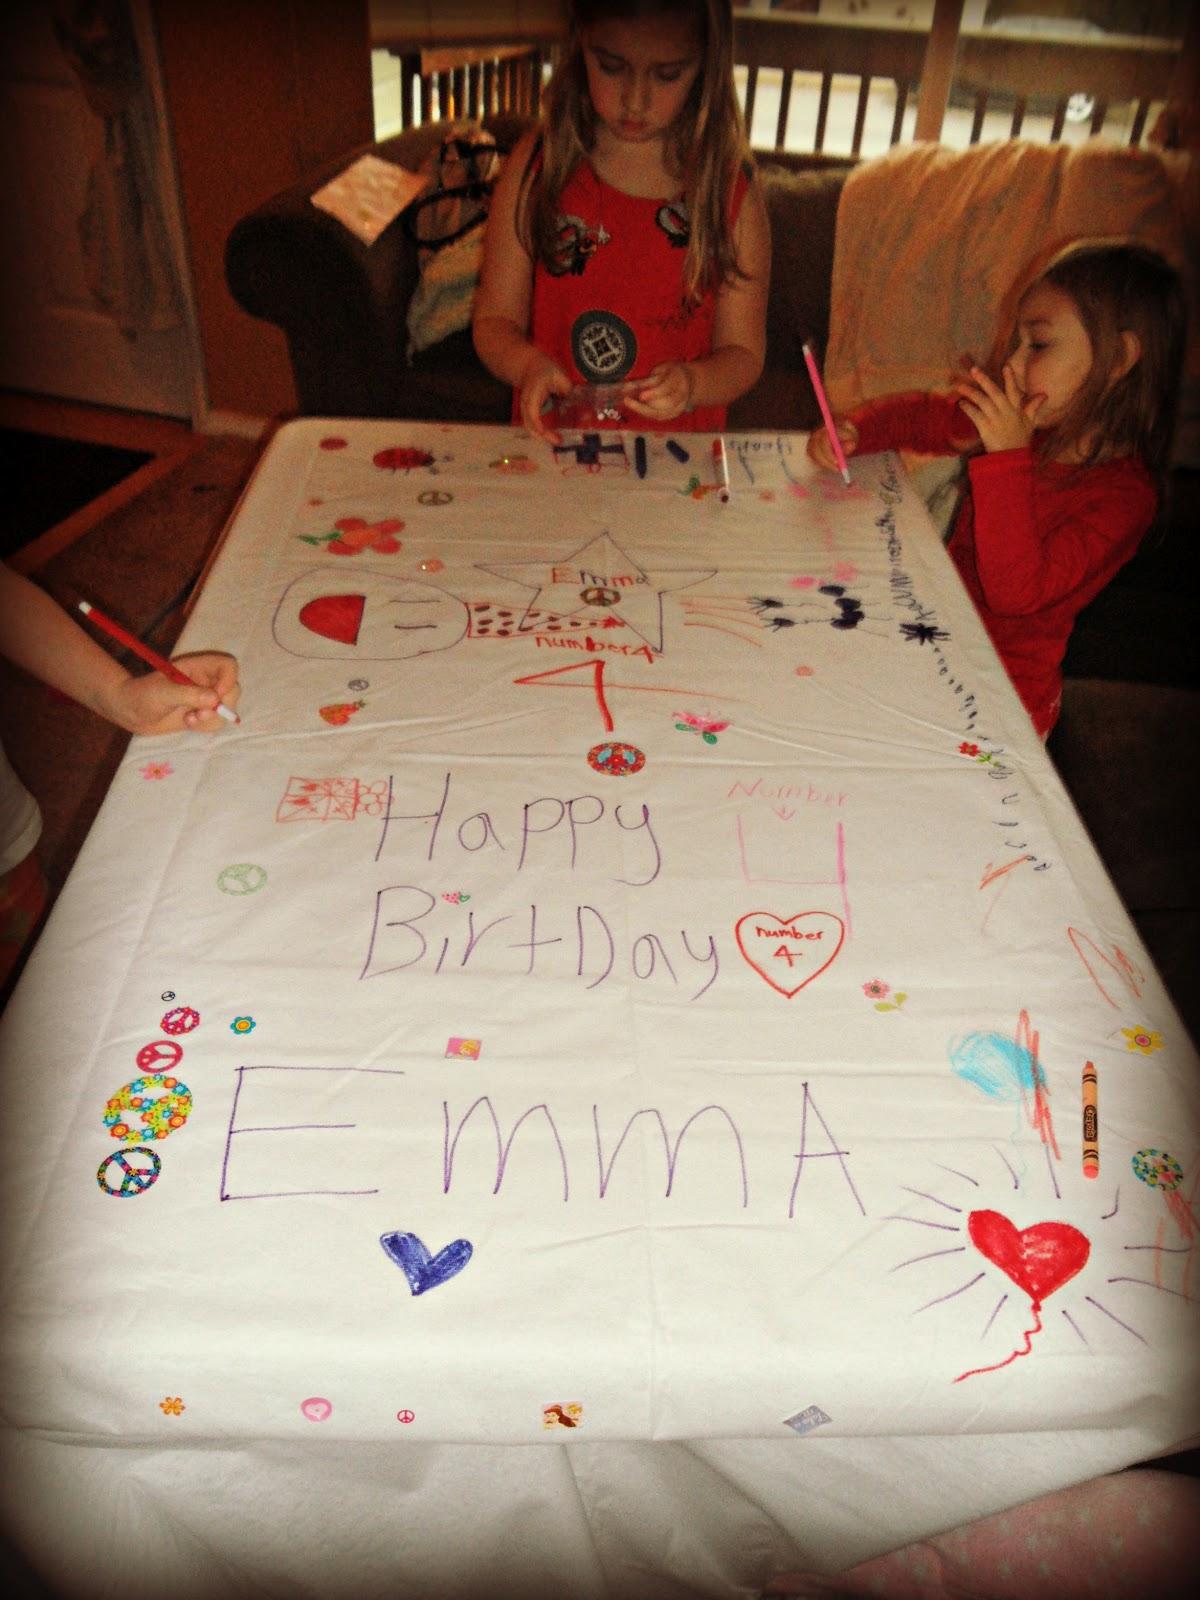 Girls sleepover craft ideas melissa kaylene for Birthday craft ideas for girls